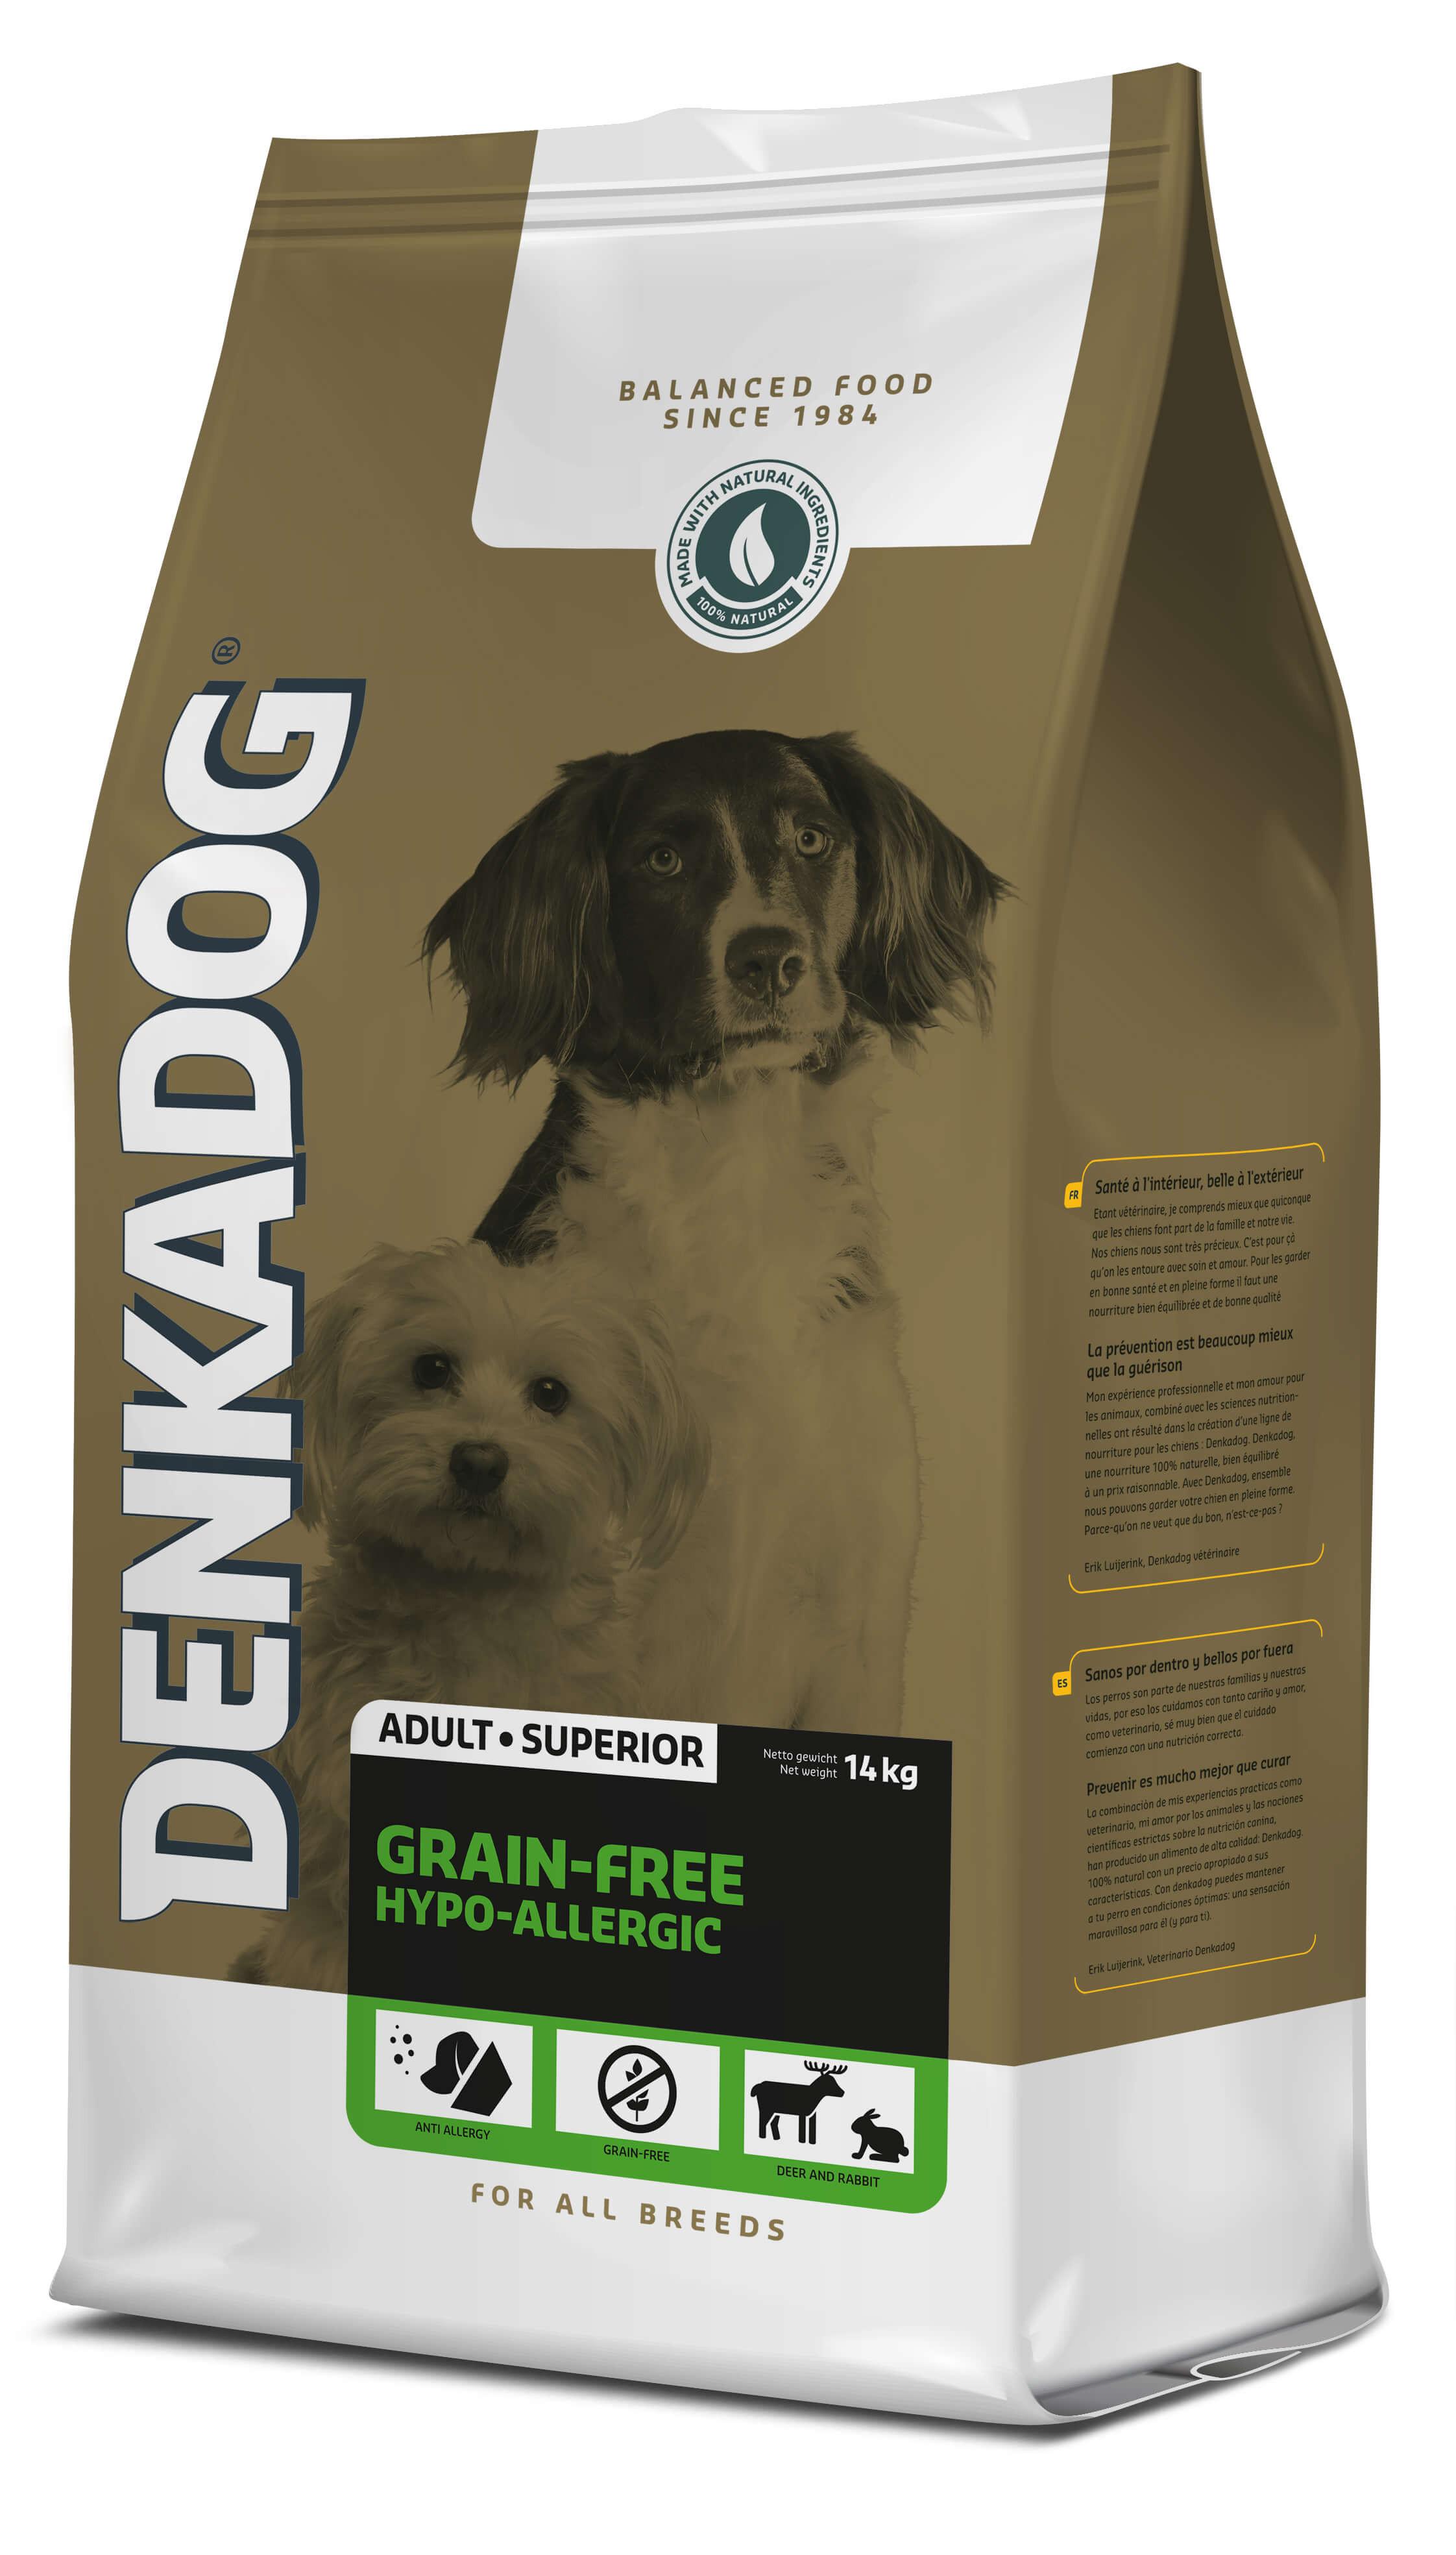 Denkadog Grain-Free Hypo-Allergic hondenvoer